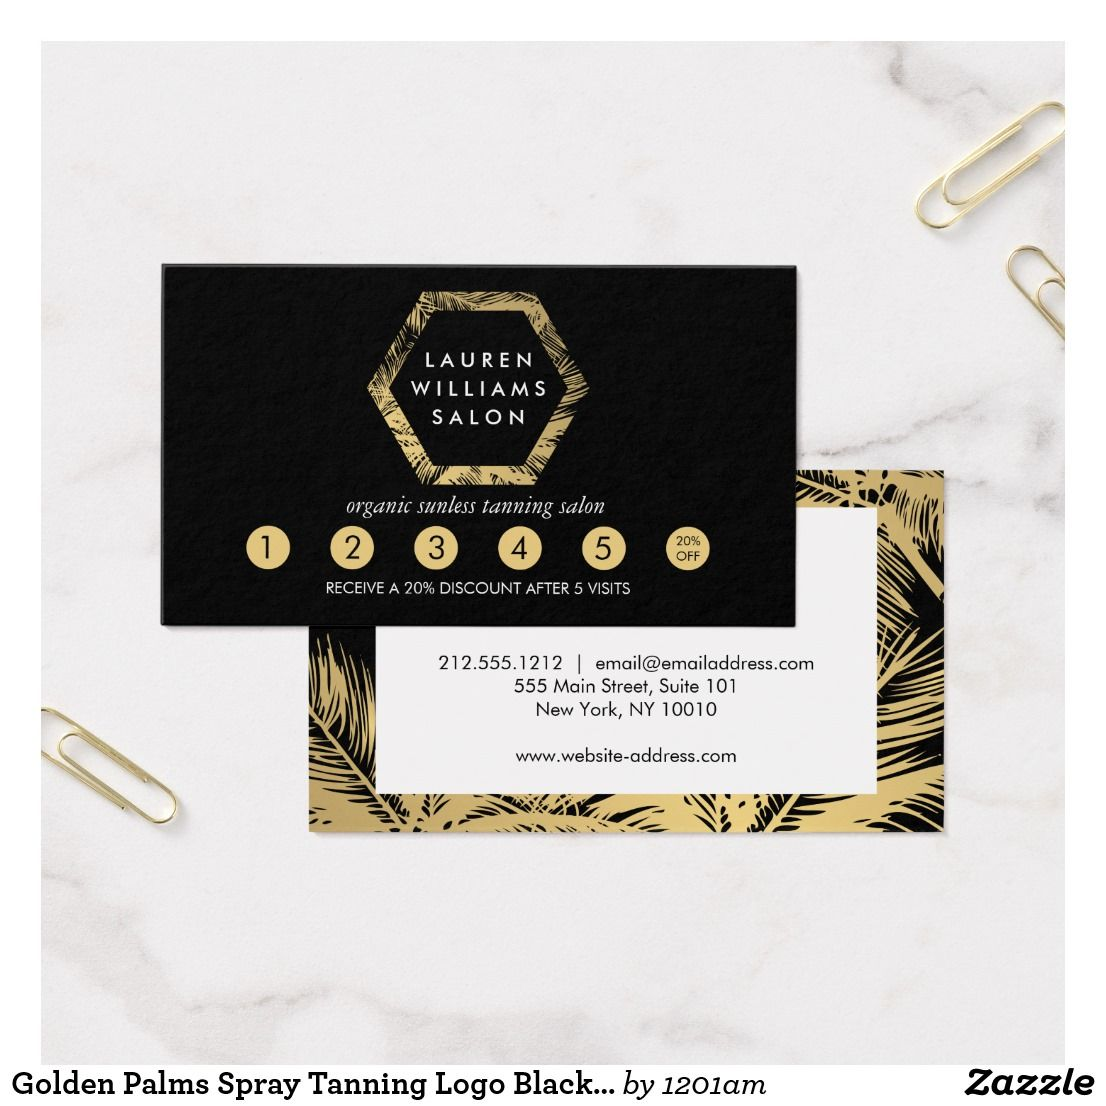 Golden Palms Spray Tanning Logo Black Loyalty Card Zazzle Com Spray Tanning Tanning Sunless Tanning Lotion